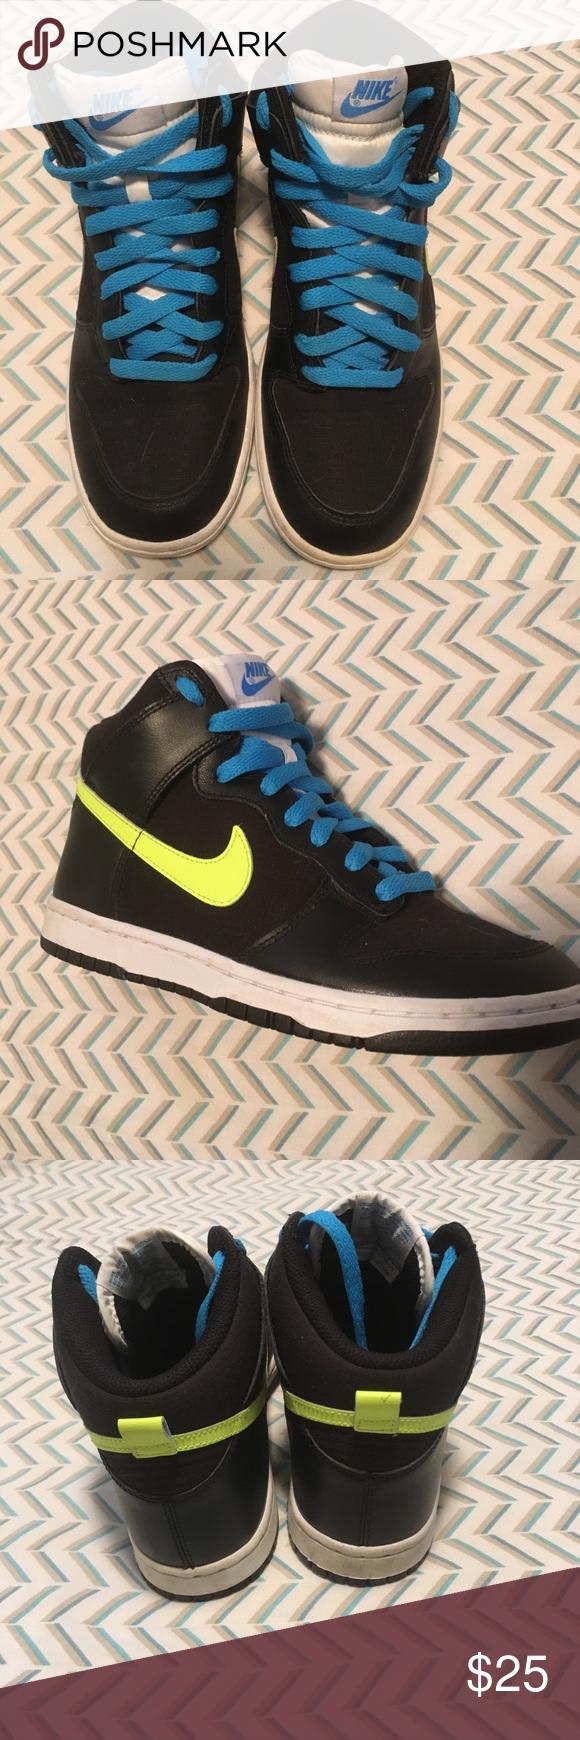 Black nikes, Nike high tops, Black nike